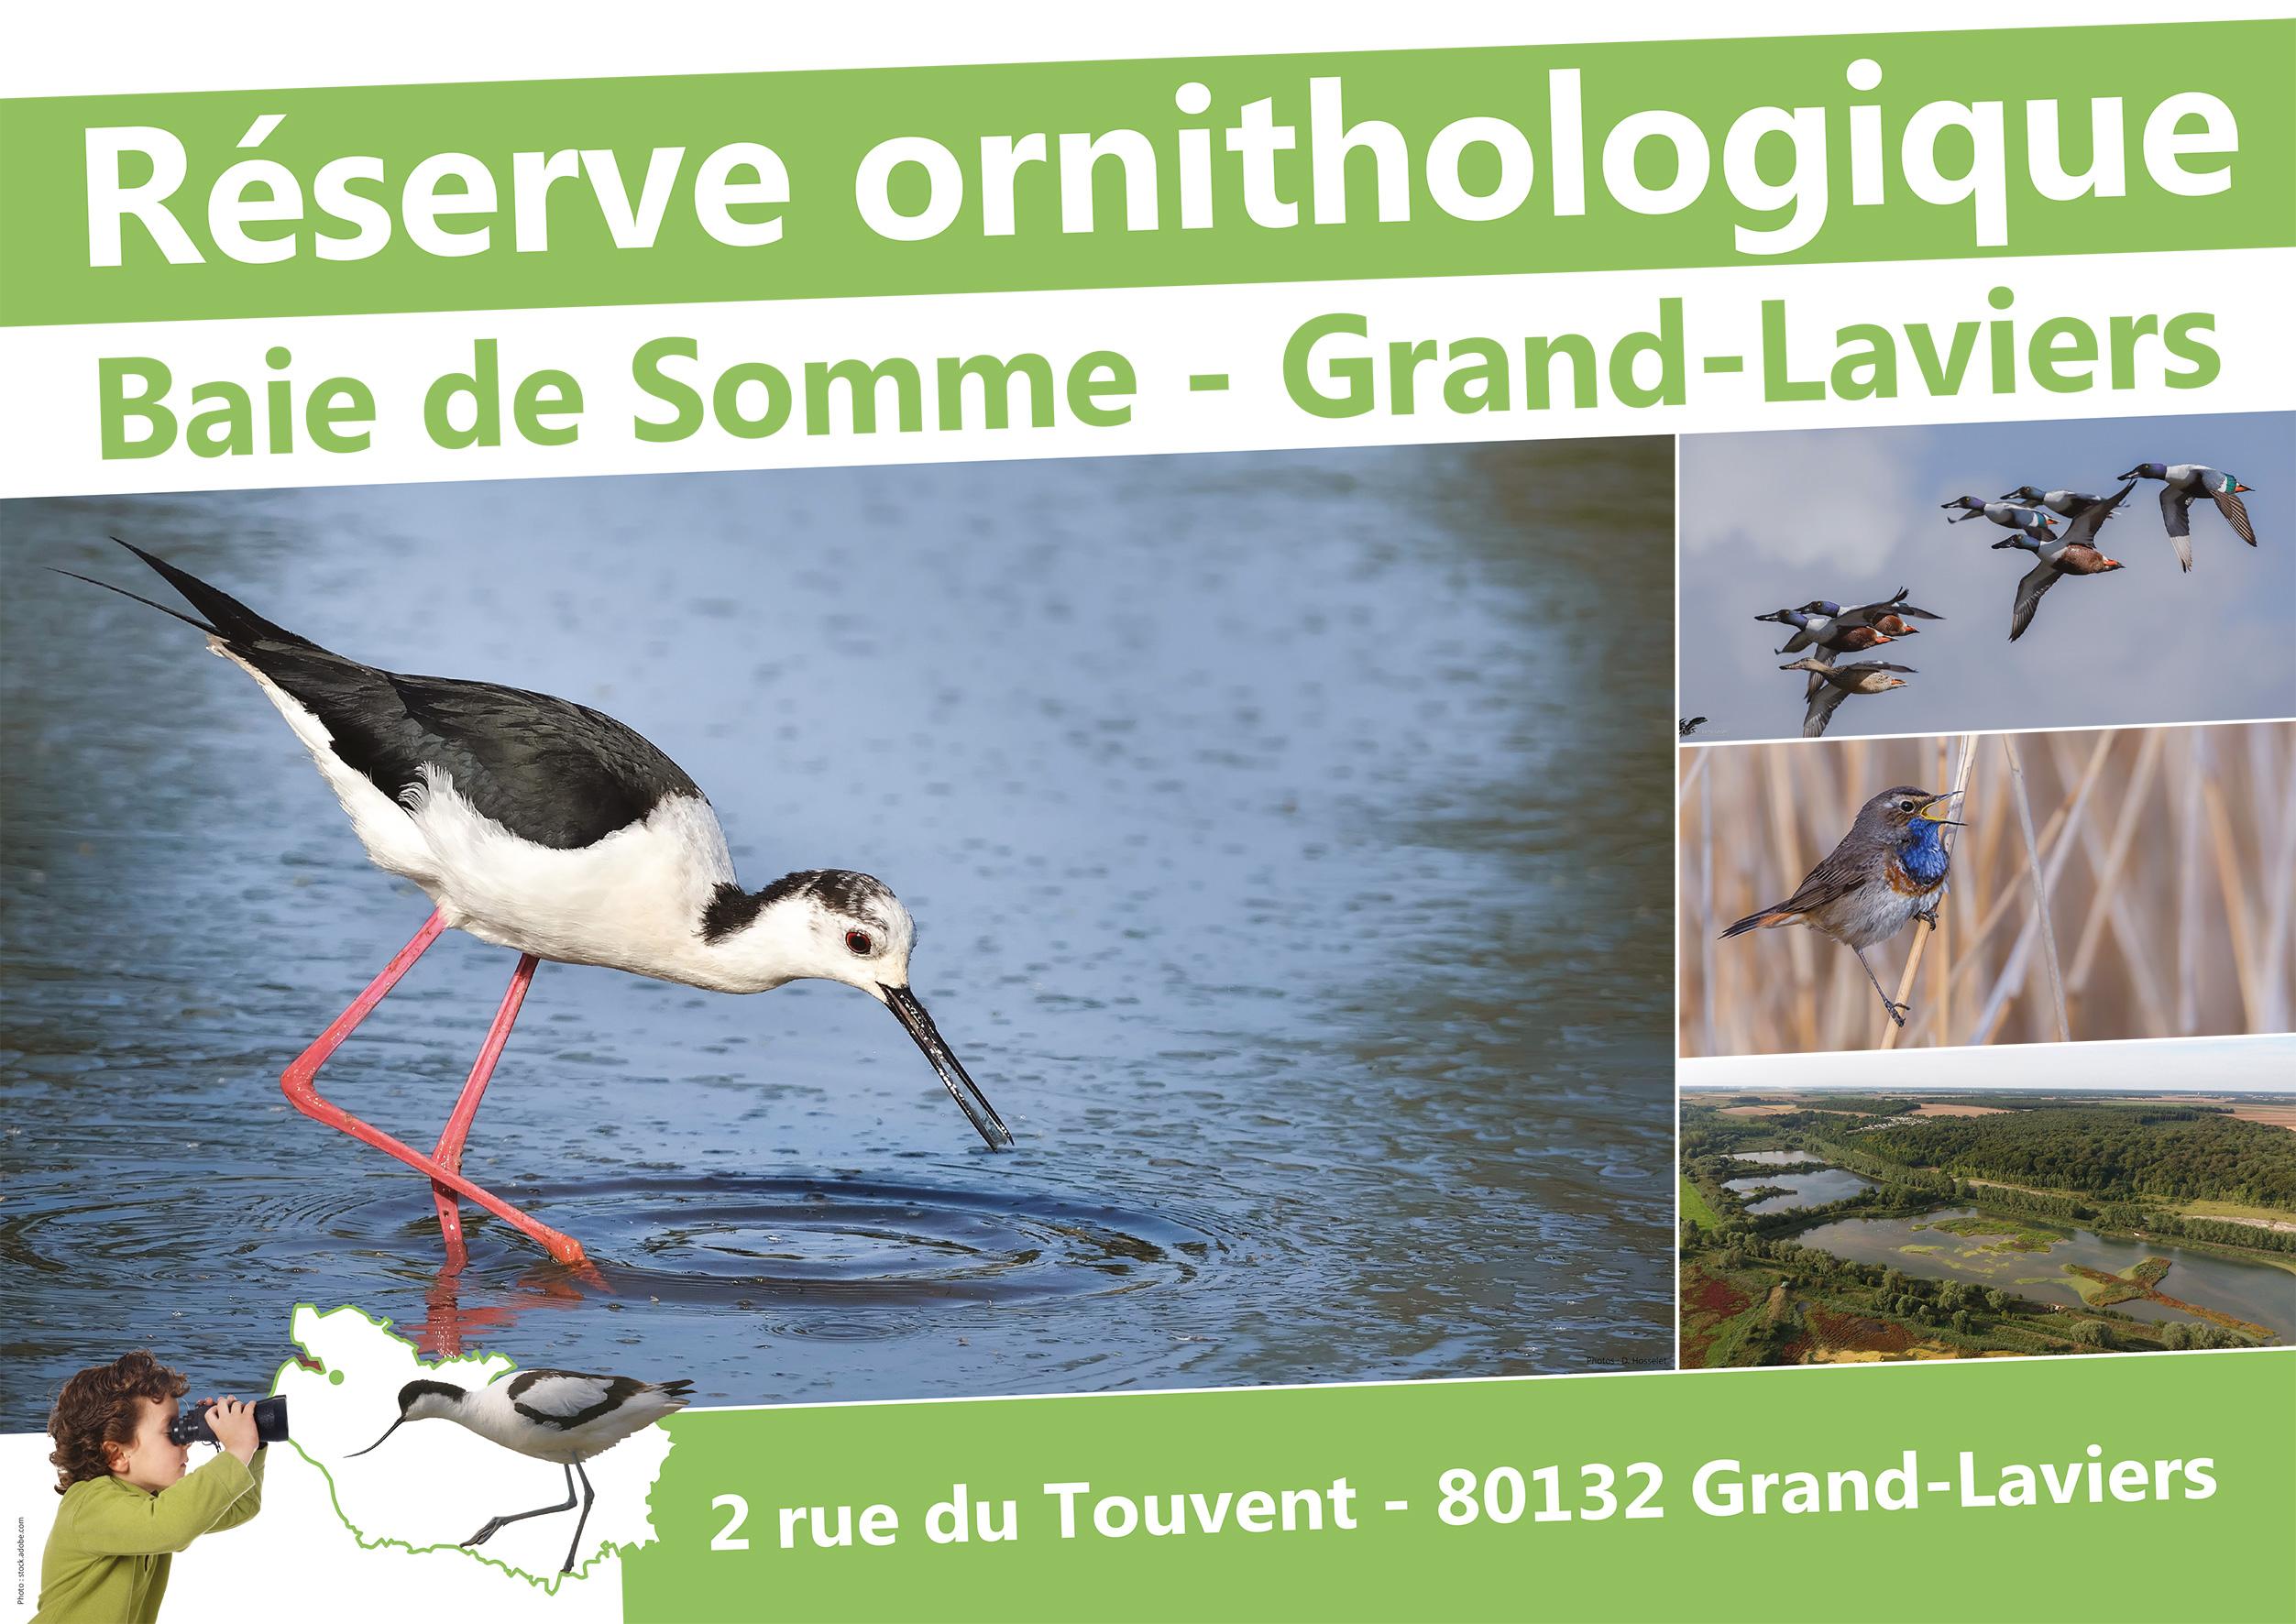 Grand-Laviers